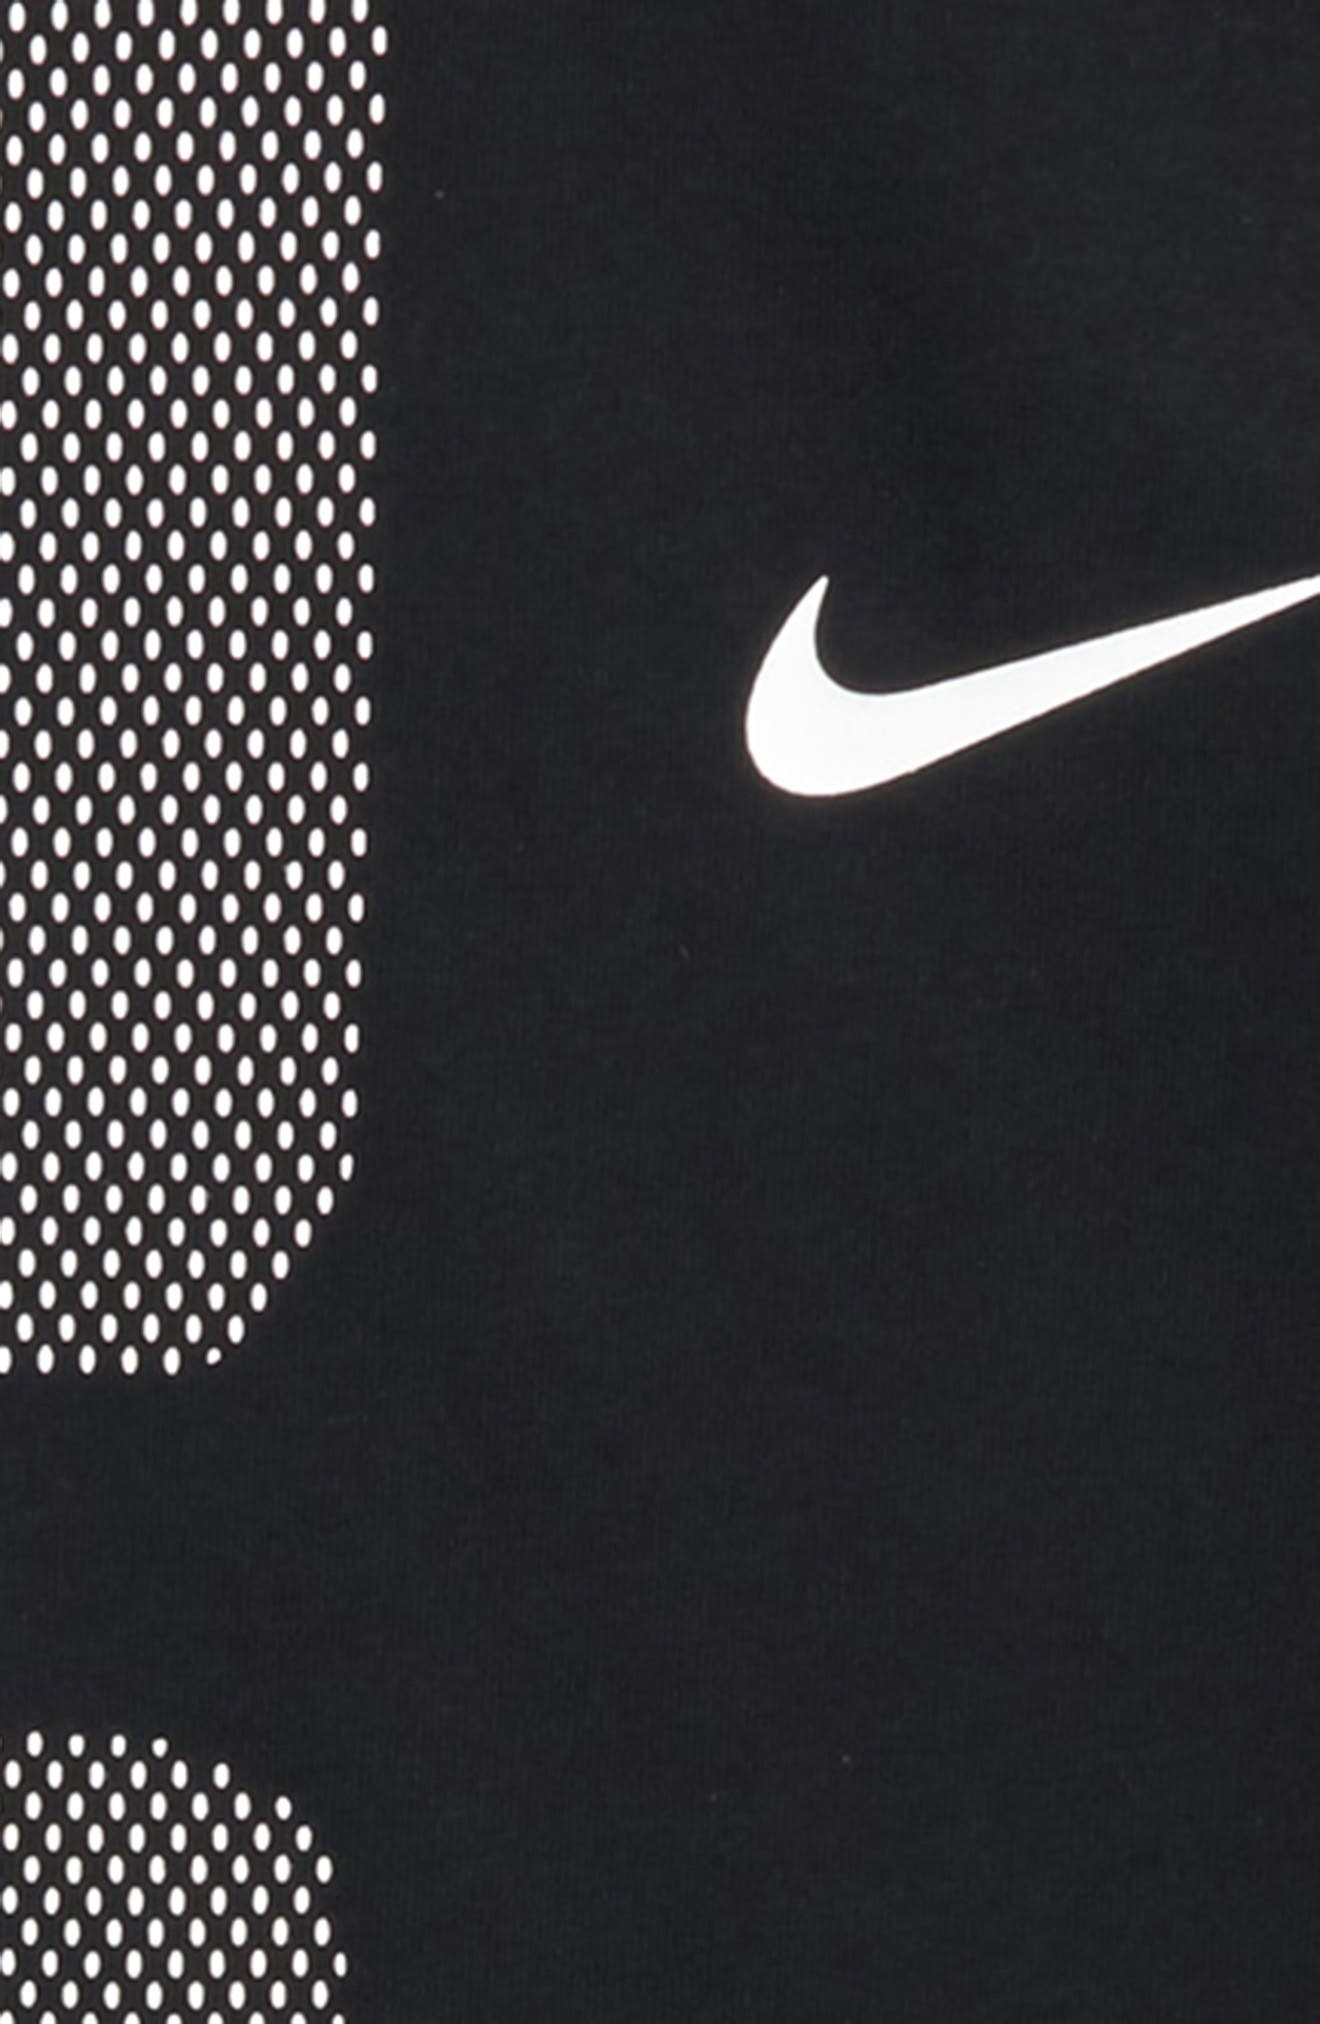 Dry Elite Athletic Fit T-Shirt,                             Alternate thumbnail 2, color,                             010